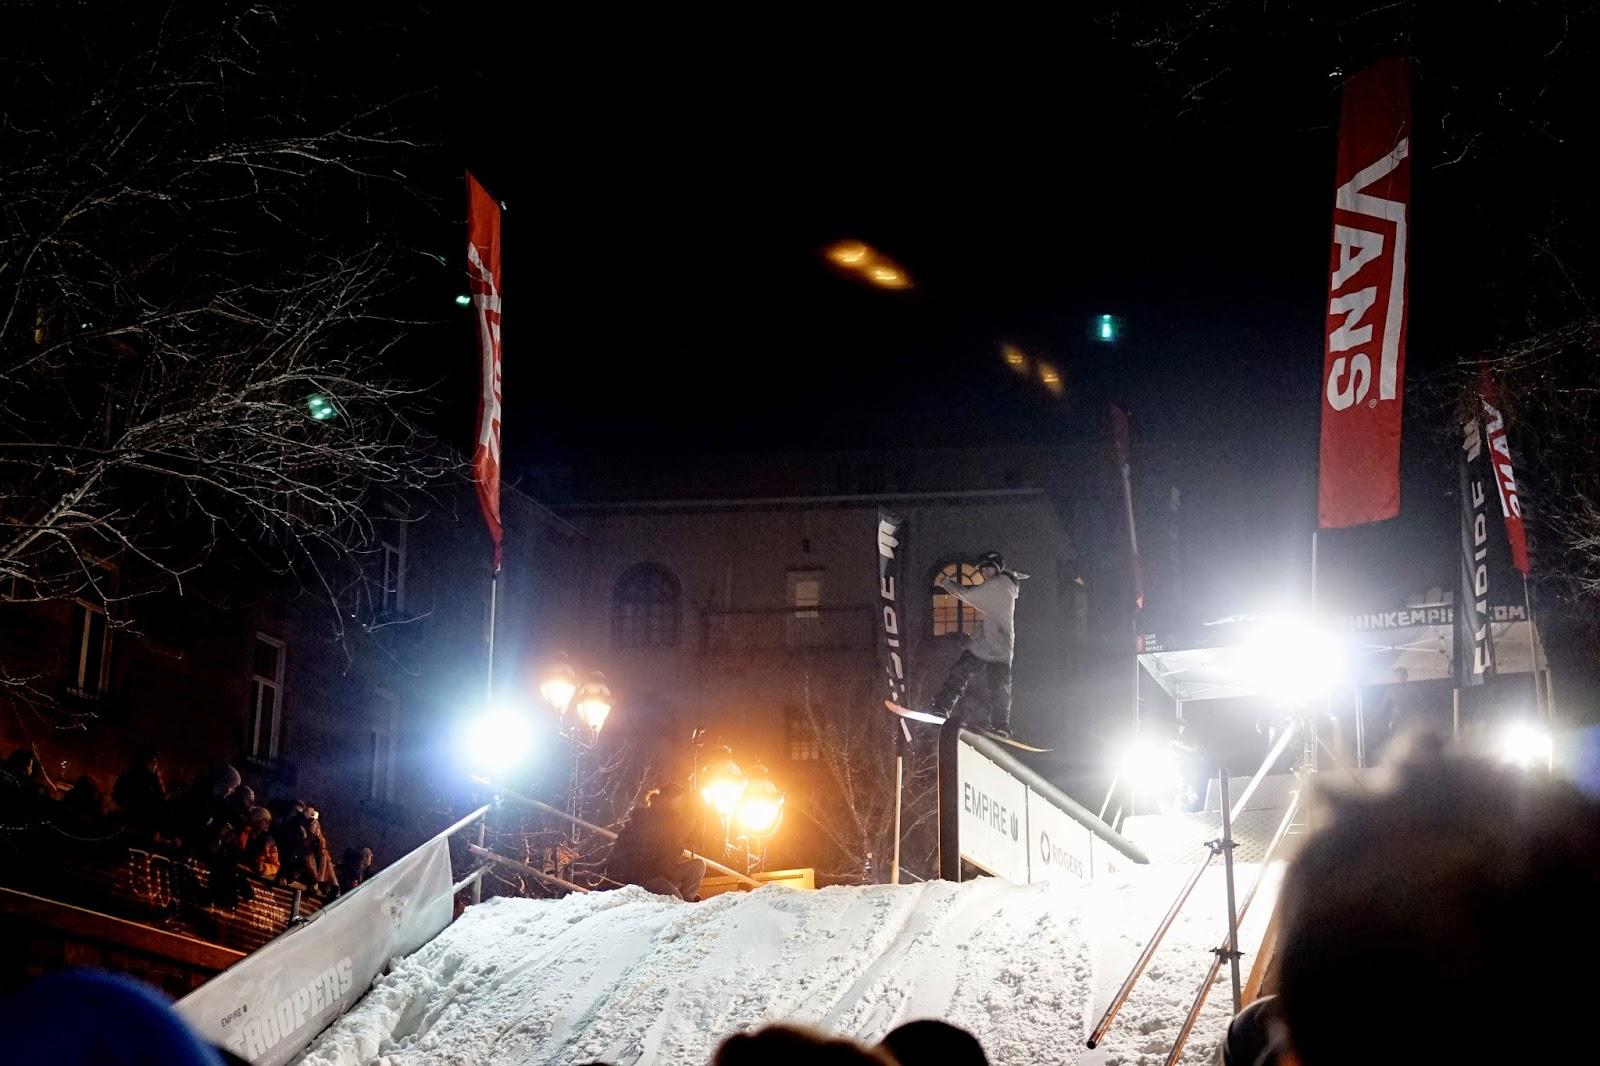 snowboarding st denis montreal